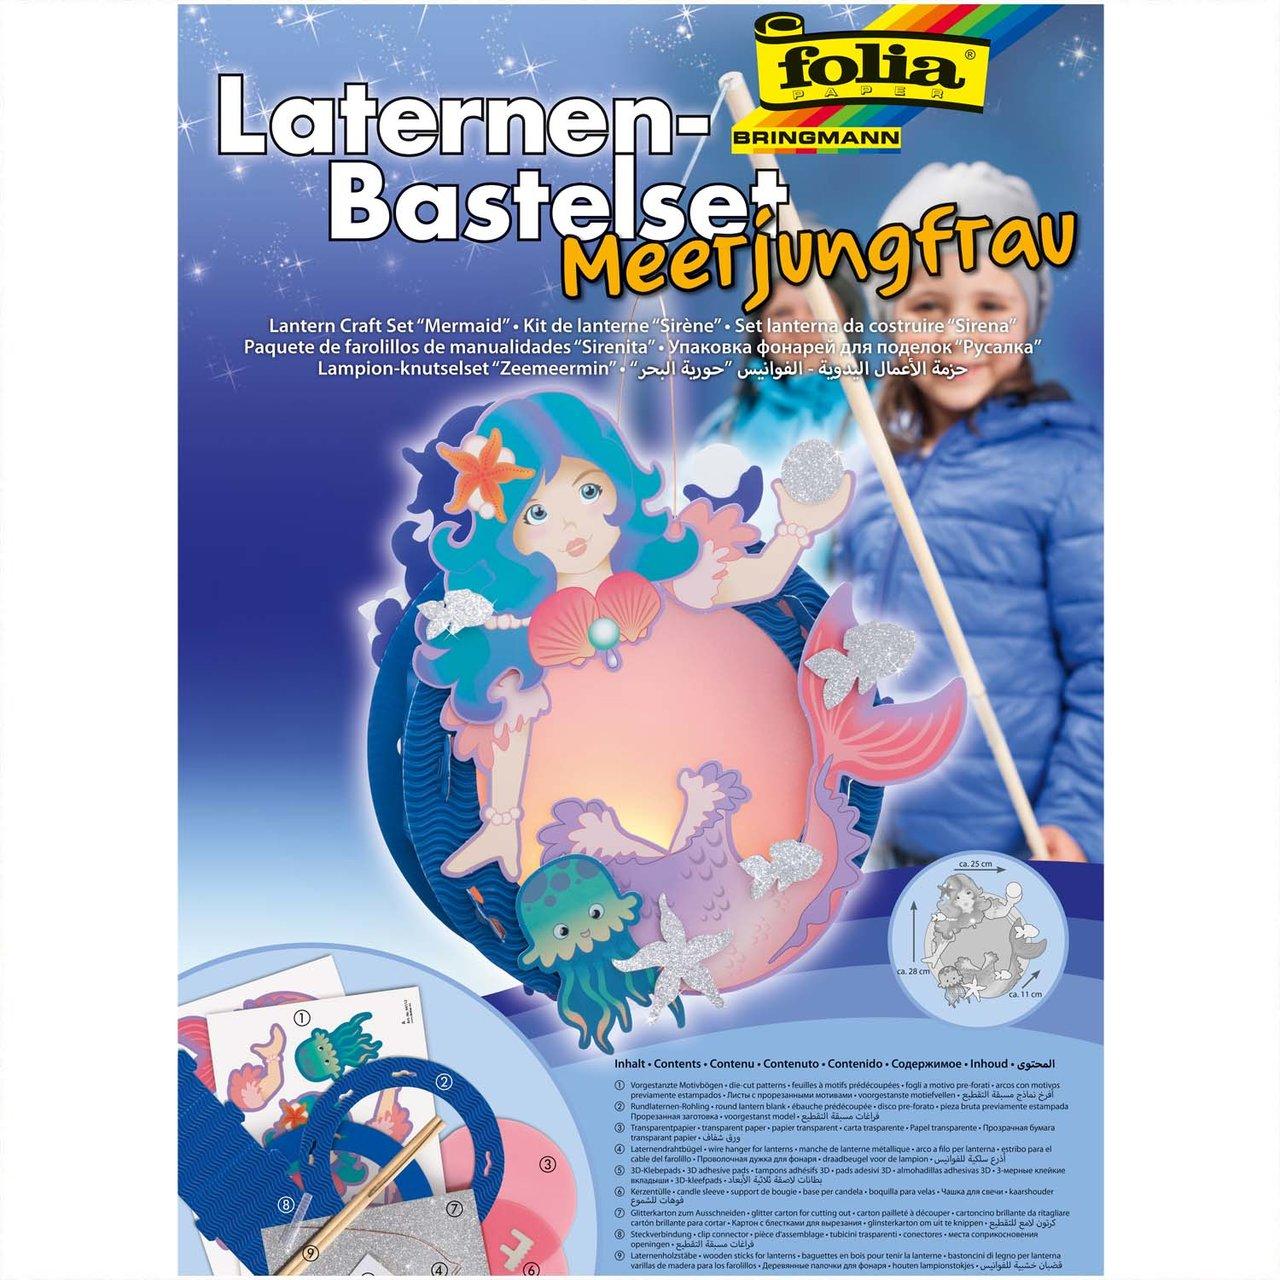 folia Laternen Set Meerjungfrau